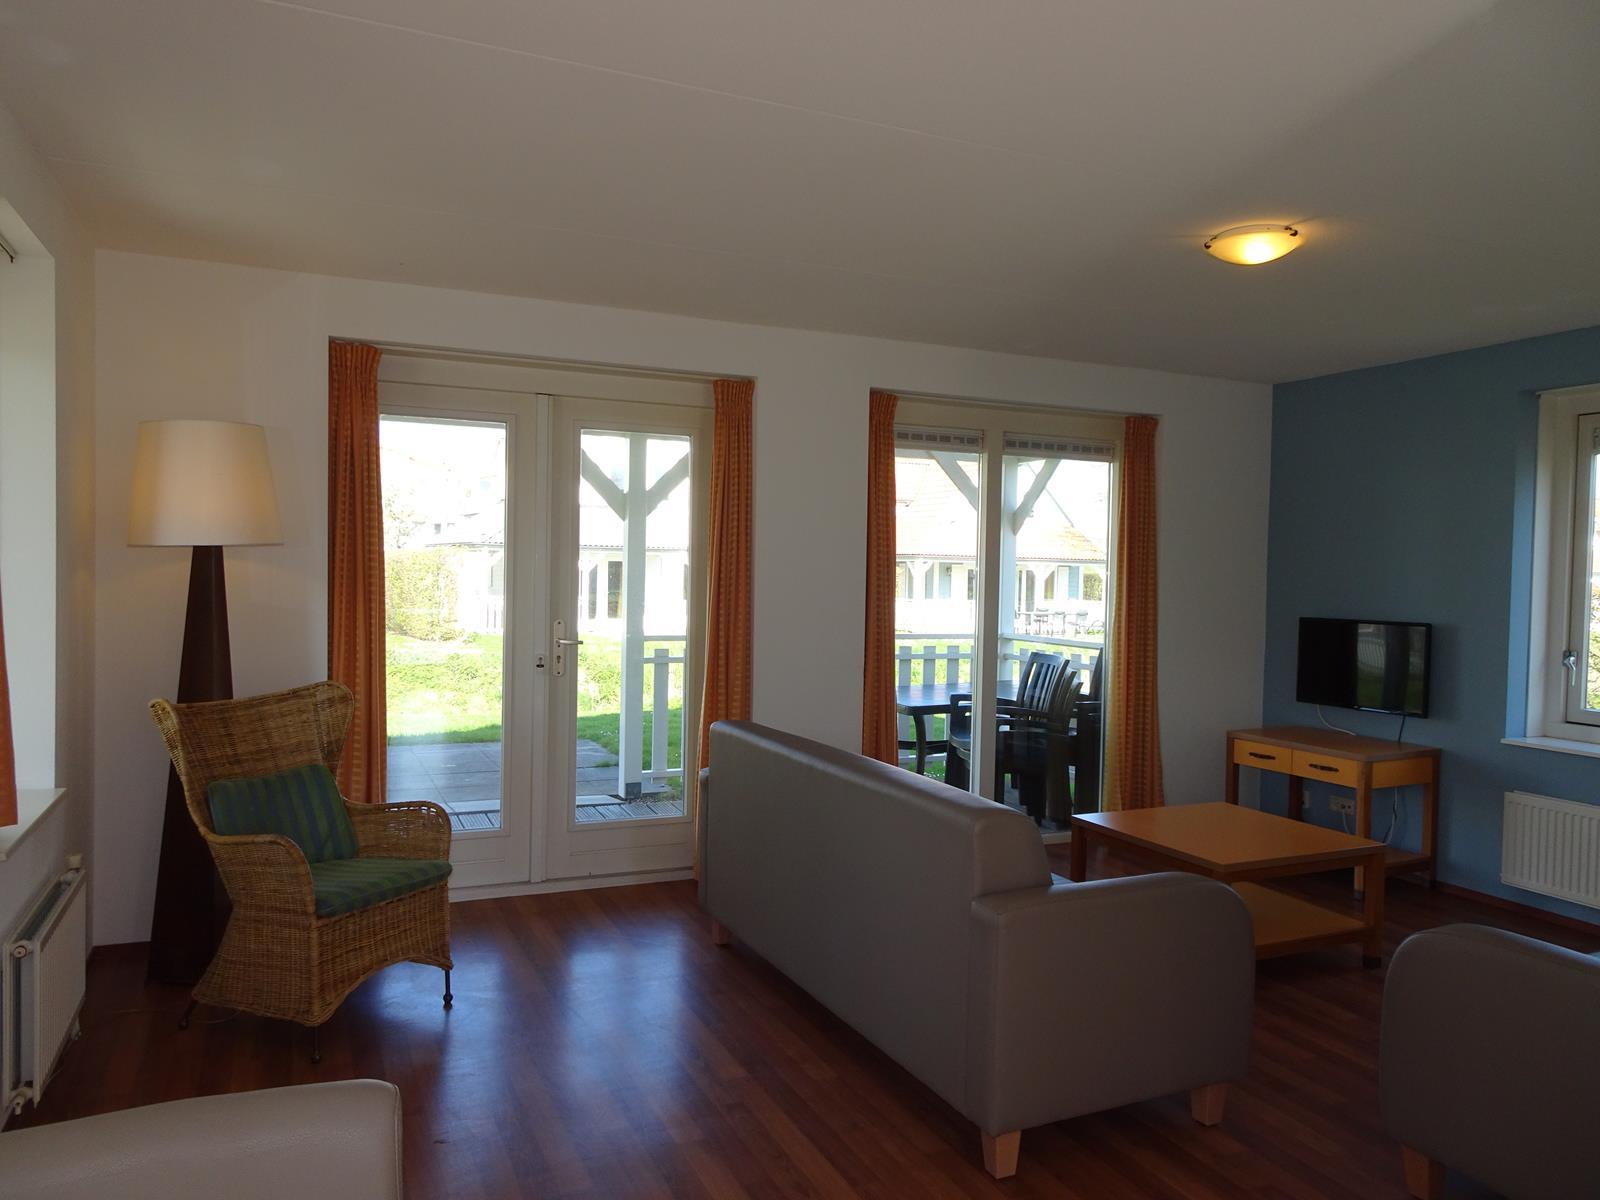 Vakantiehuis te koop Zeeland Bruinisse K41 (7).jpg